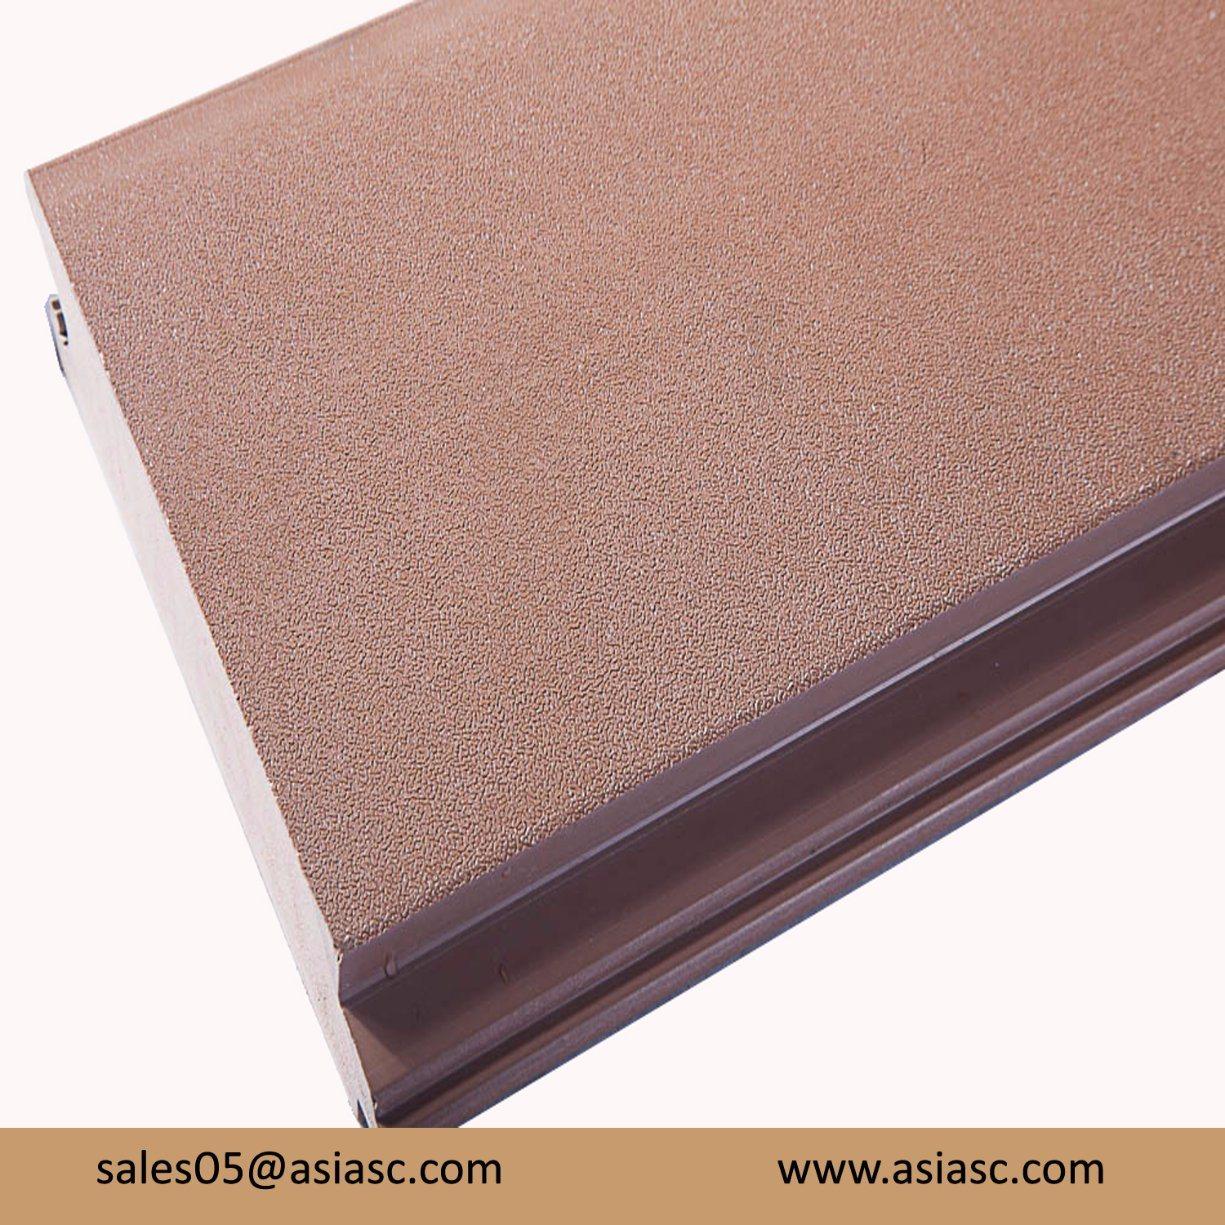 Outdoor WPC-Alternative PVC Flooring Tiles